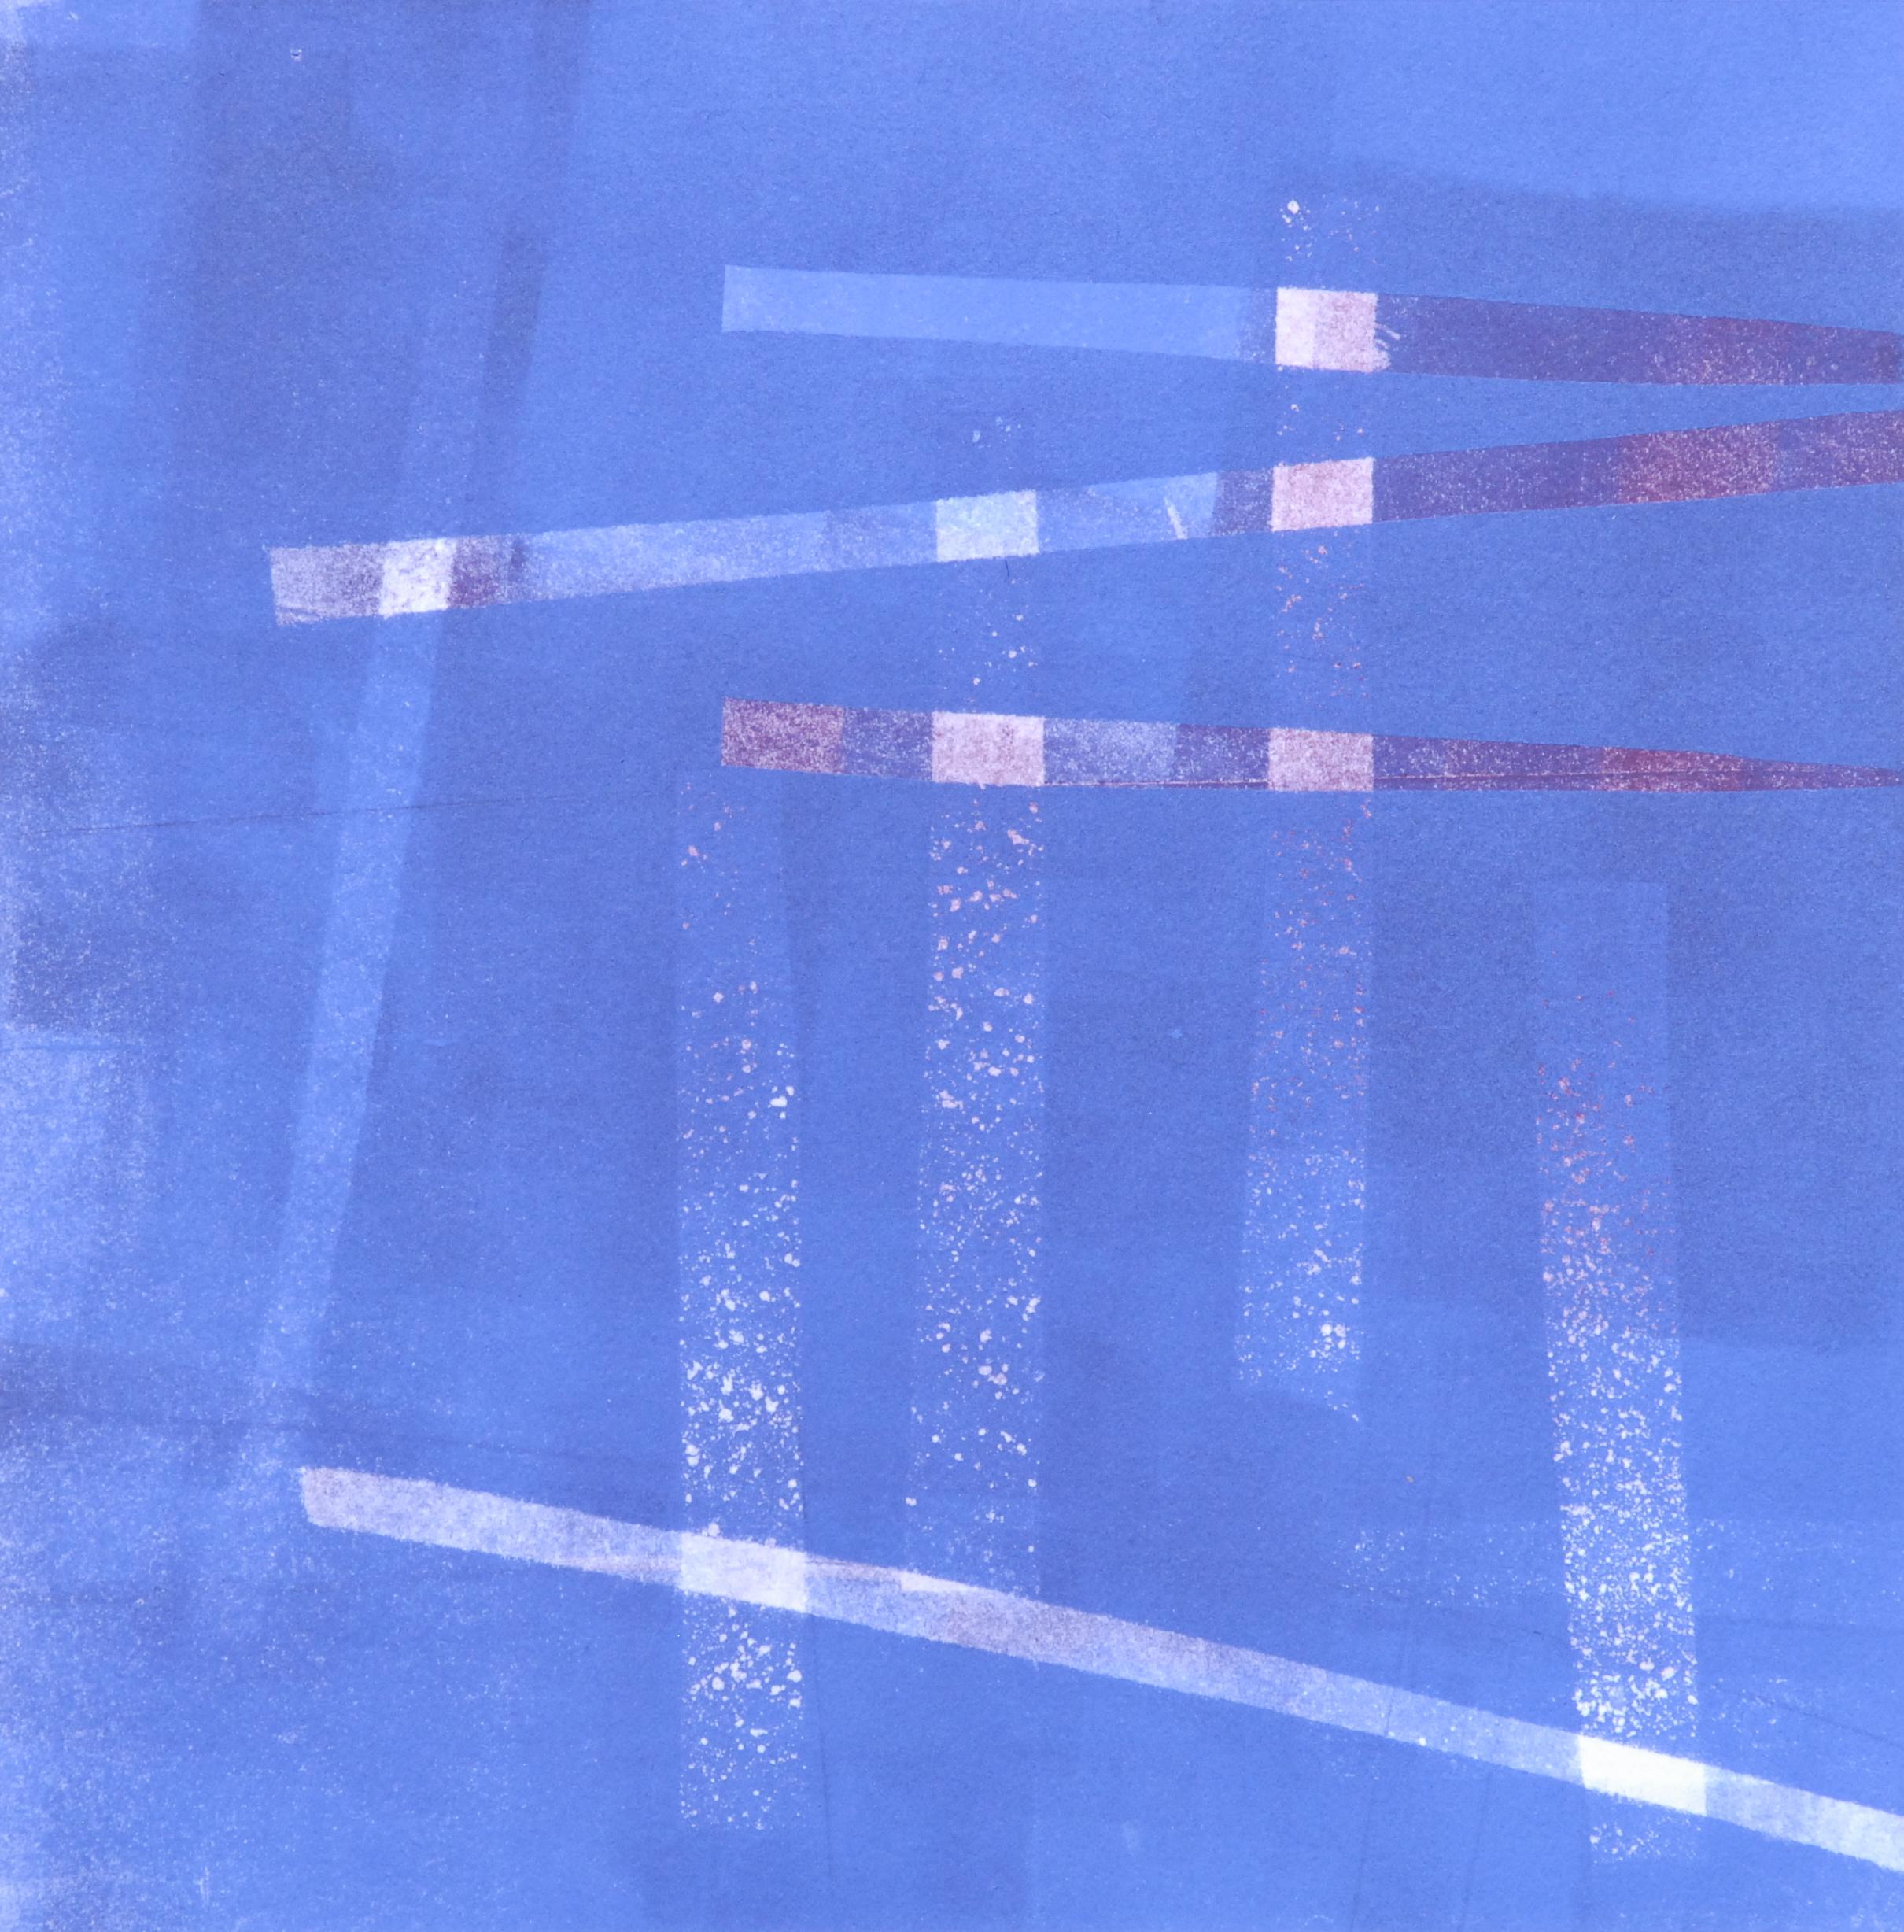 "Sodium Deviation 47, 2016  monoprint  10"" x 10"" image on 11"" x 14"" paper"